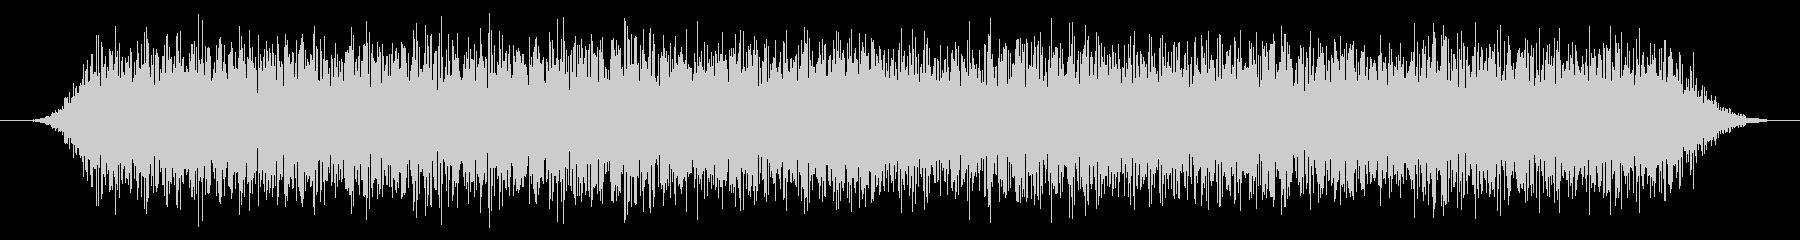 SNES レース01-04(スターティンの未再生の波形